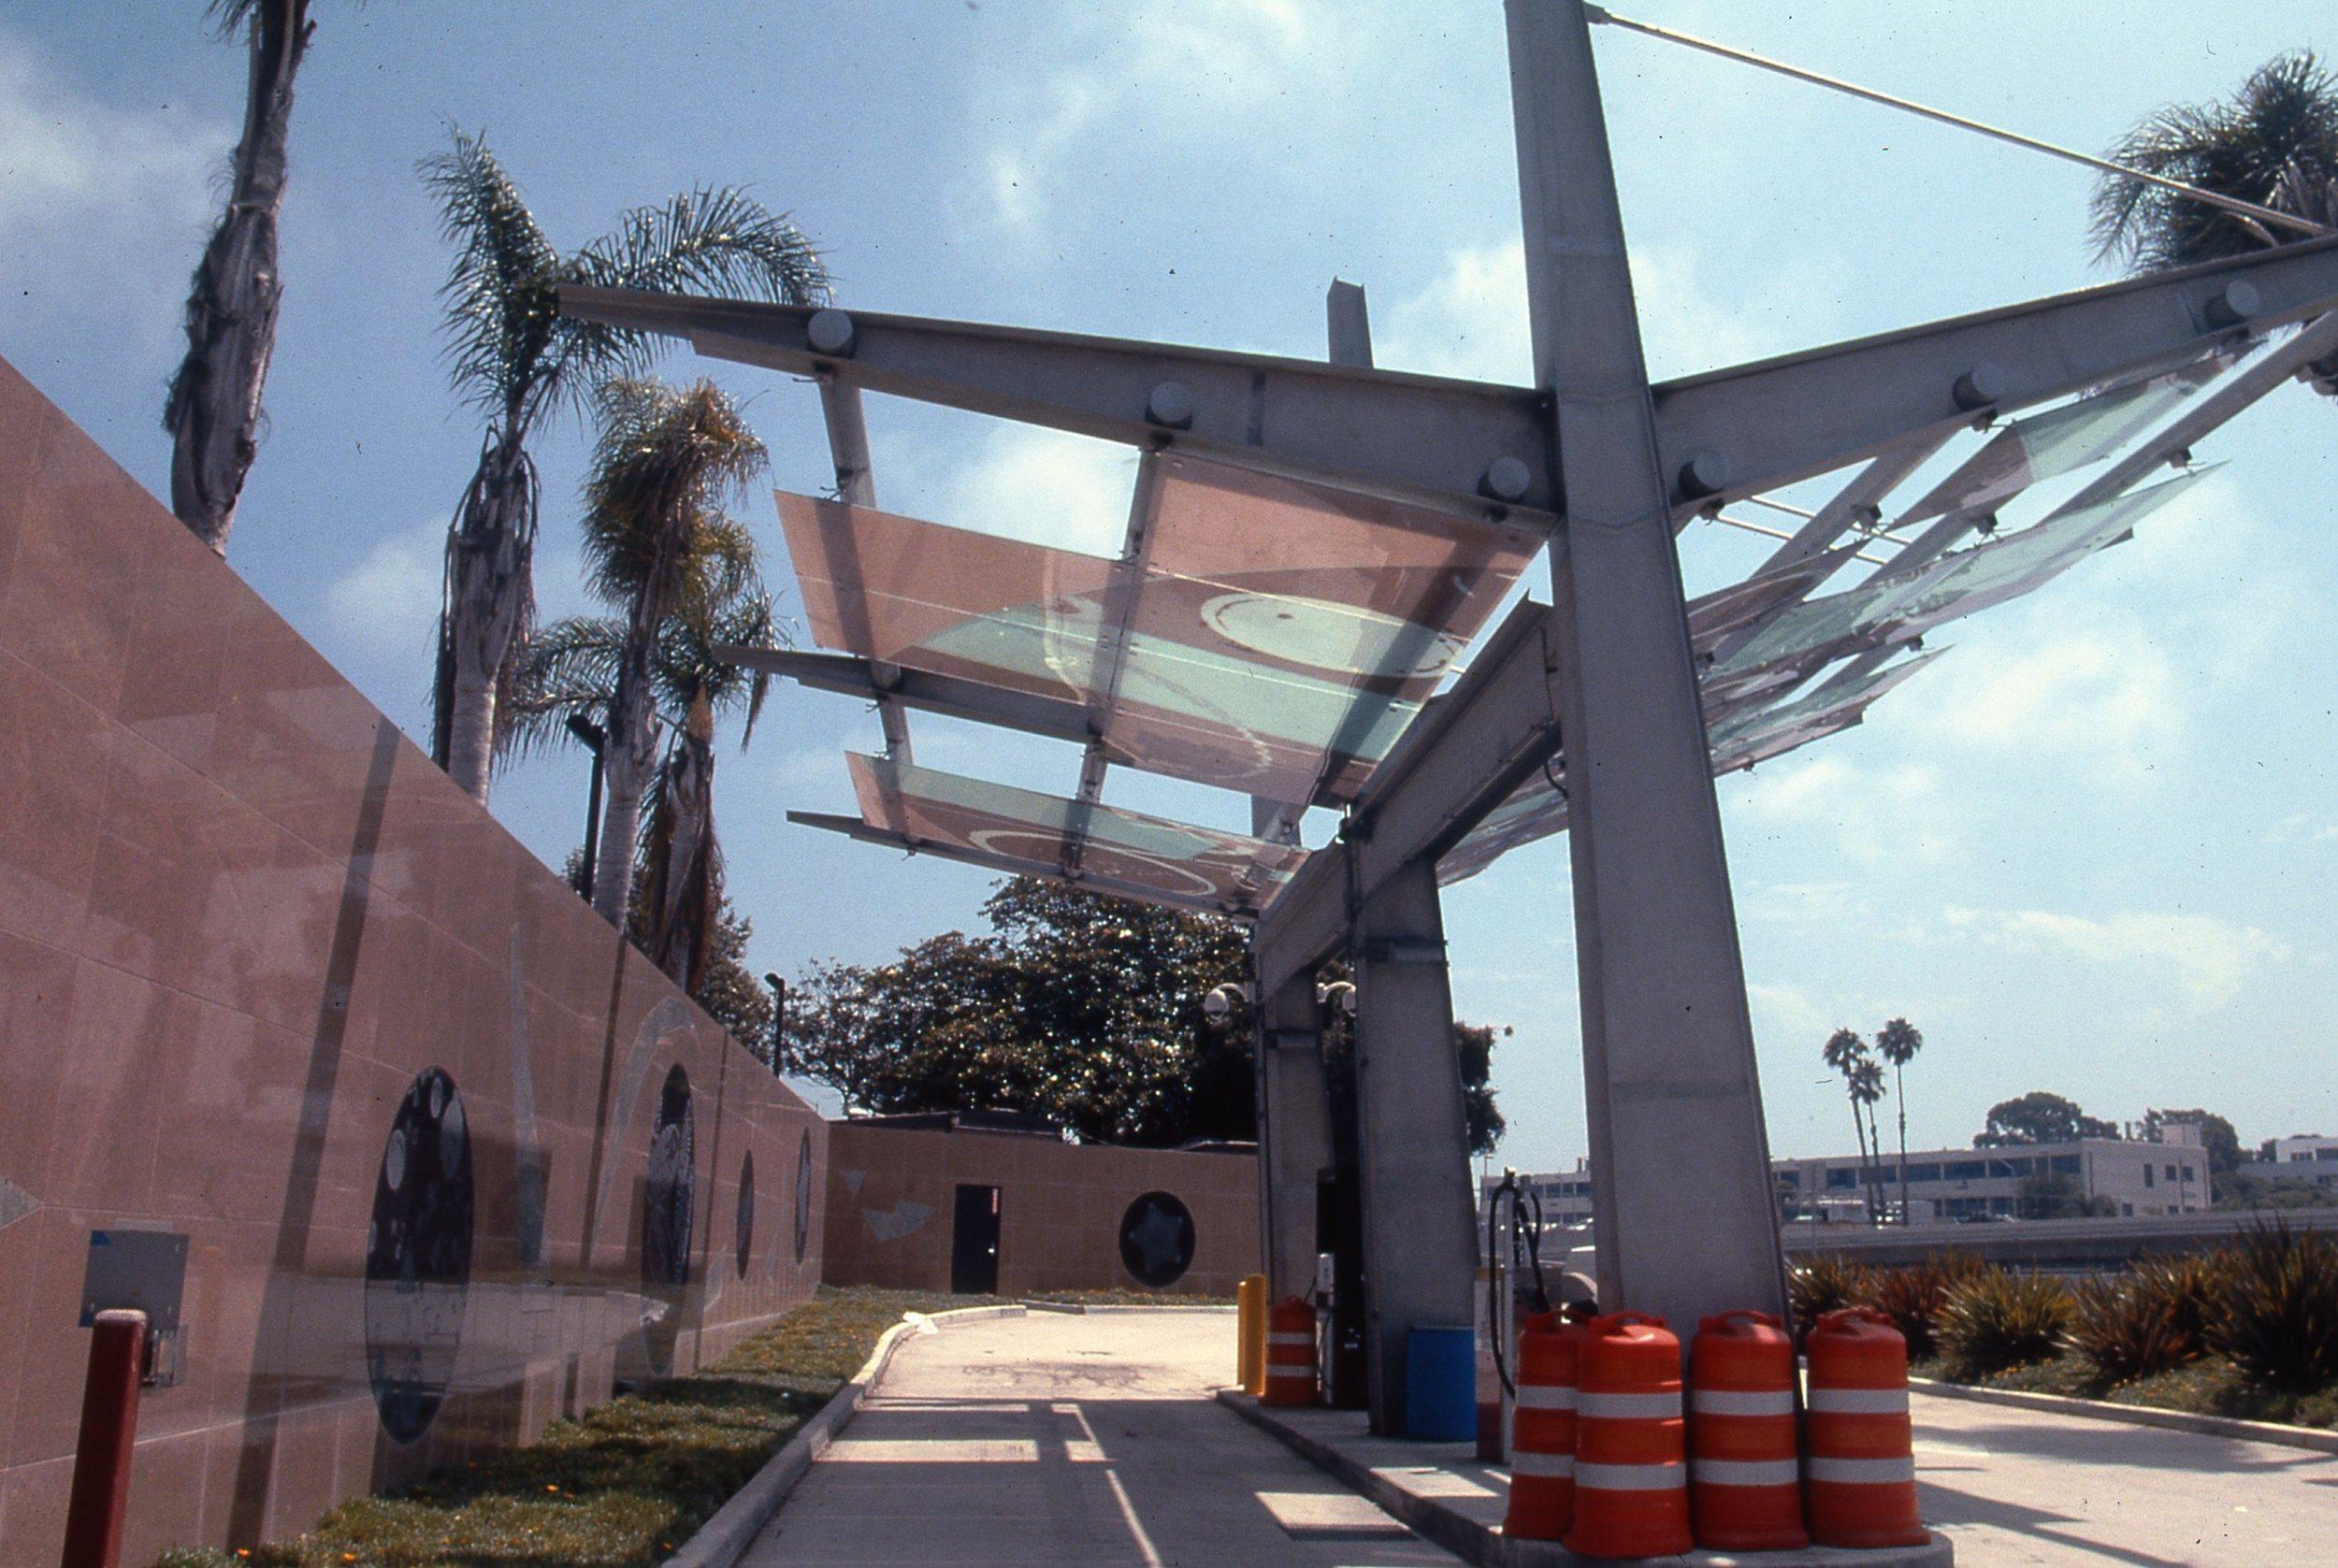 """Big Blue Bus Facility Expansion Project""    2002 - 2005 Glass canopy design and etchedgranite artwork   © Richard Wyatt Jr."